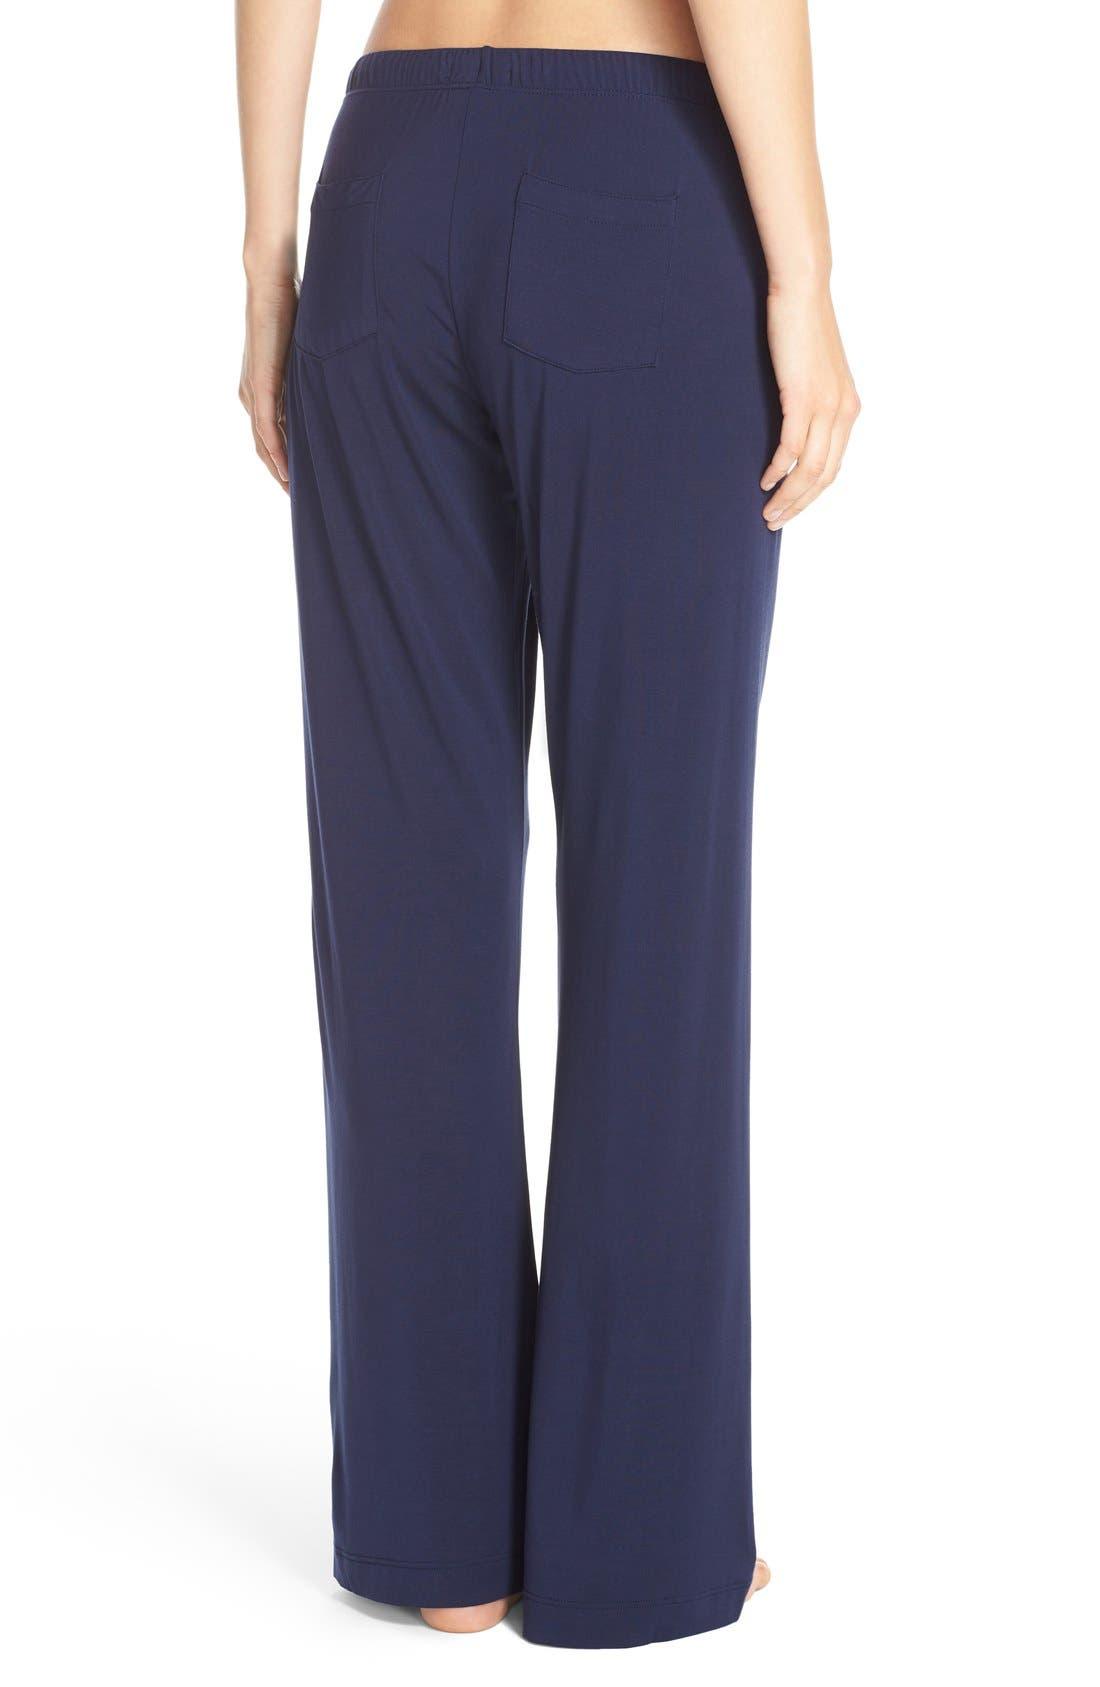 Lounge Pants,                             Alternate thumbnail 2, color,                             Peacoat